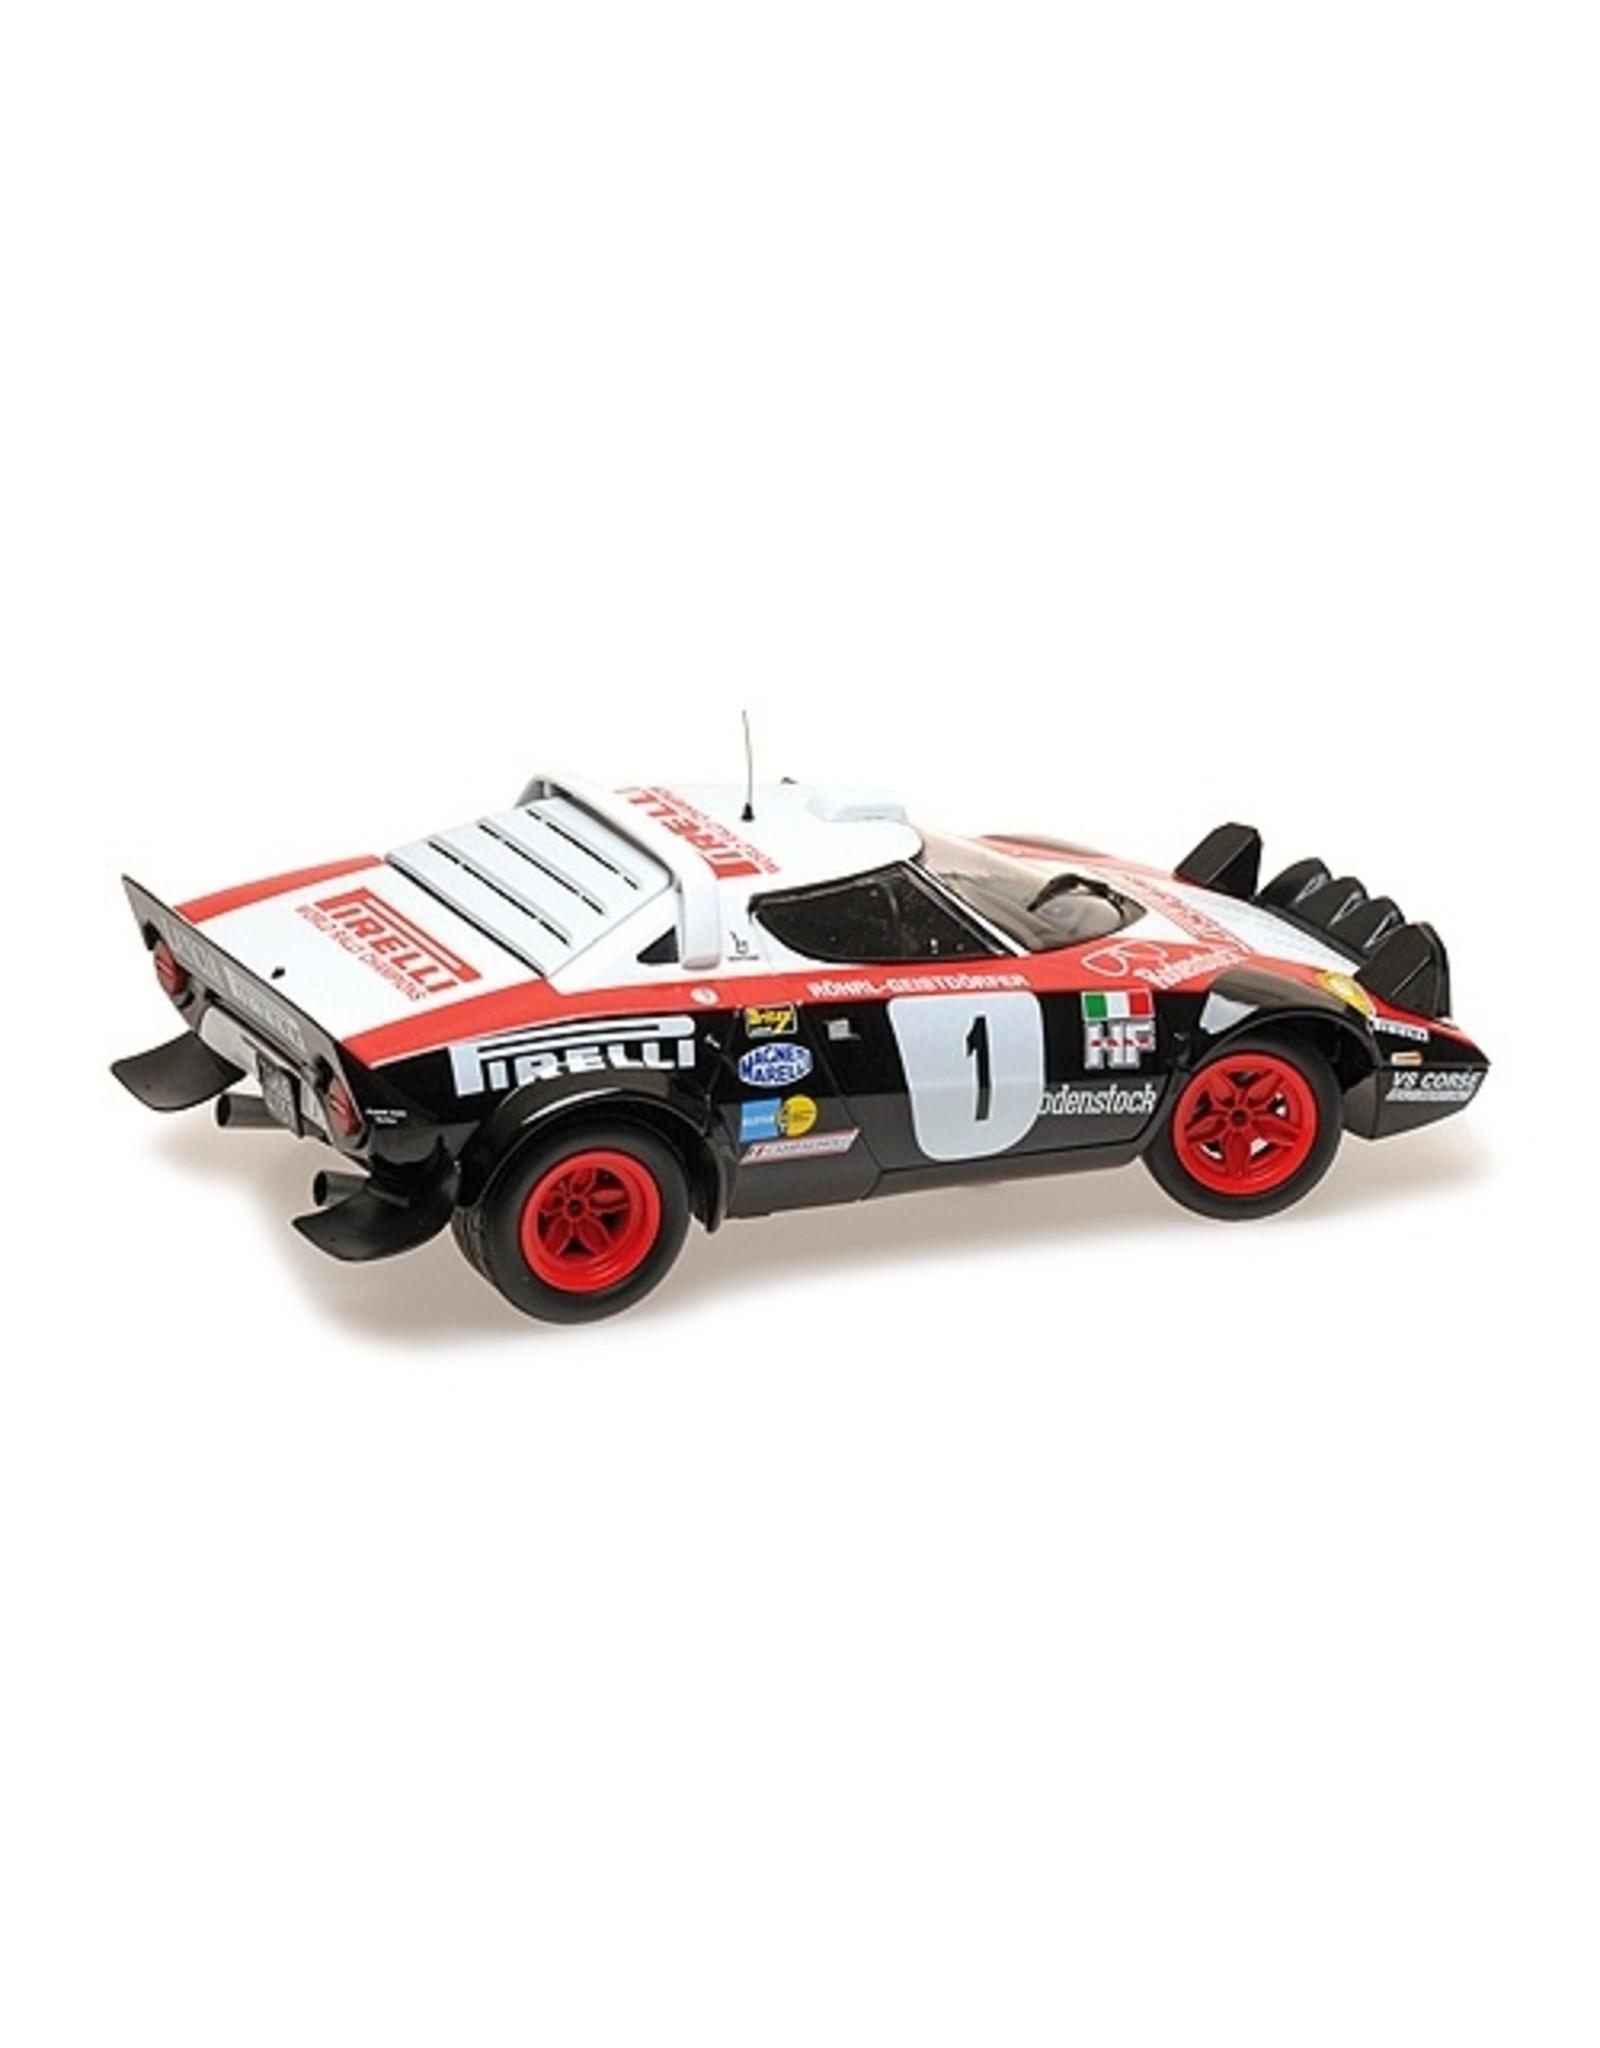 Lancia Lancia Stratos Lancia Pirelli #1 Winners Dynavit Saarland Rallye 1978 - 1:18 - Minichamps